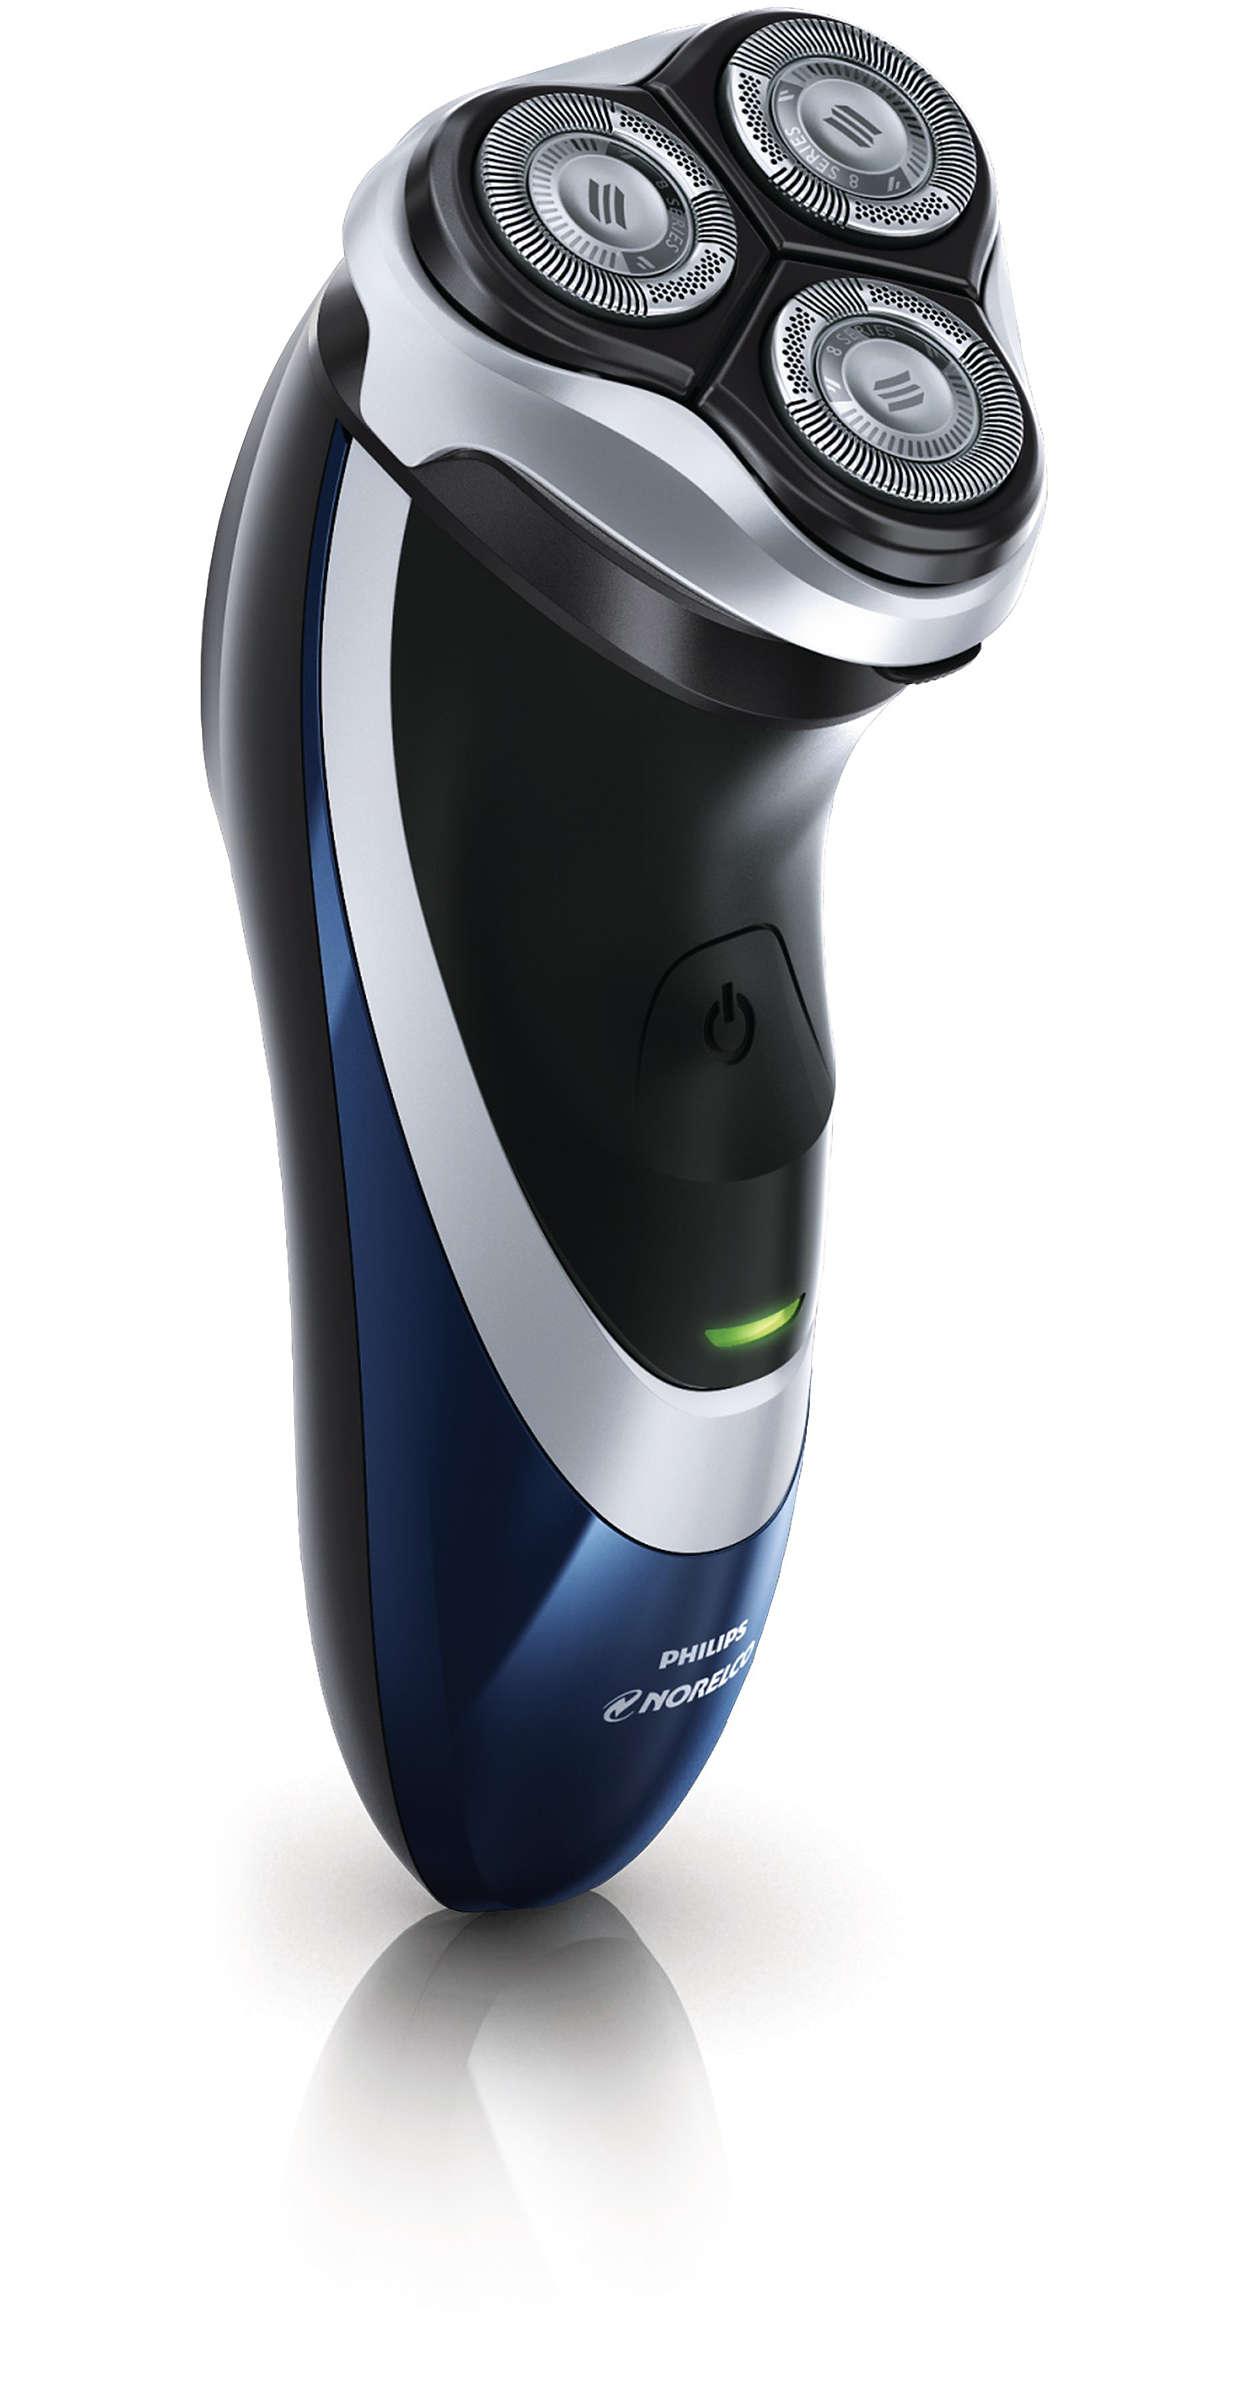 DualPrecision, gründlichere Rasur